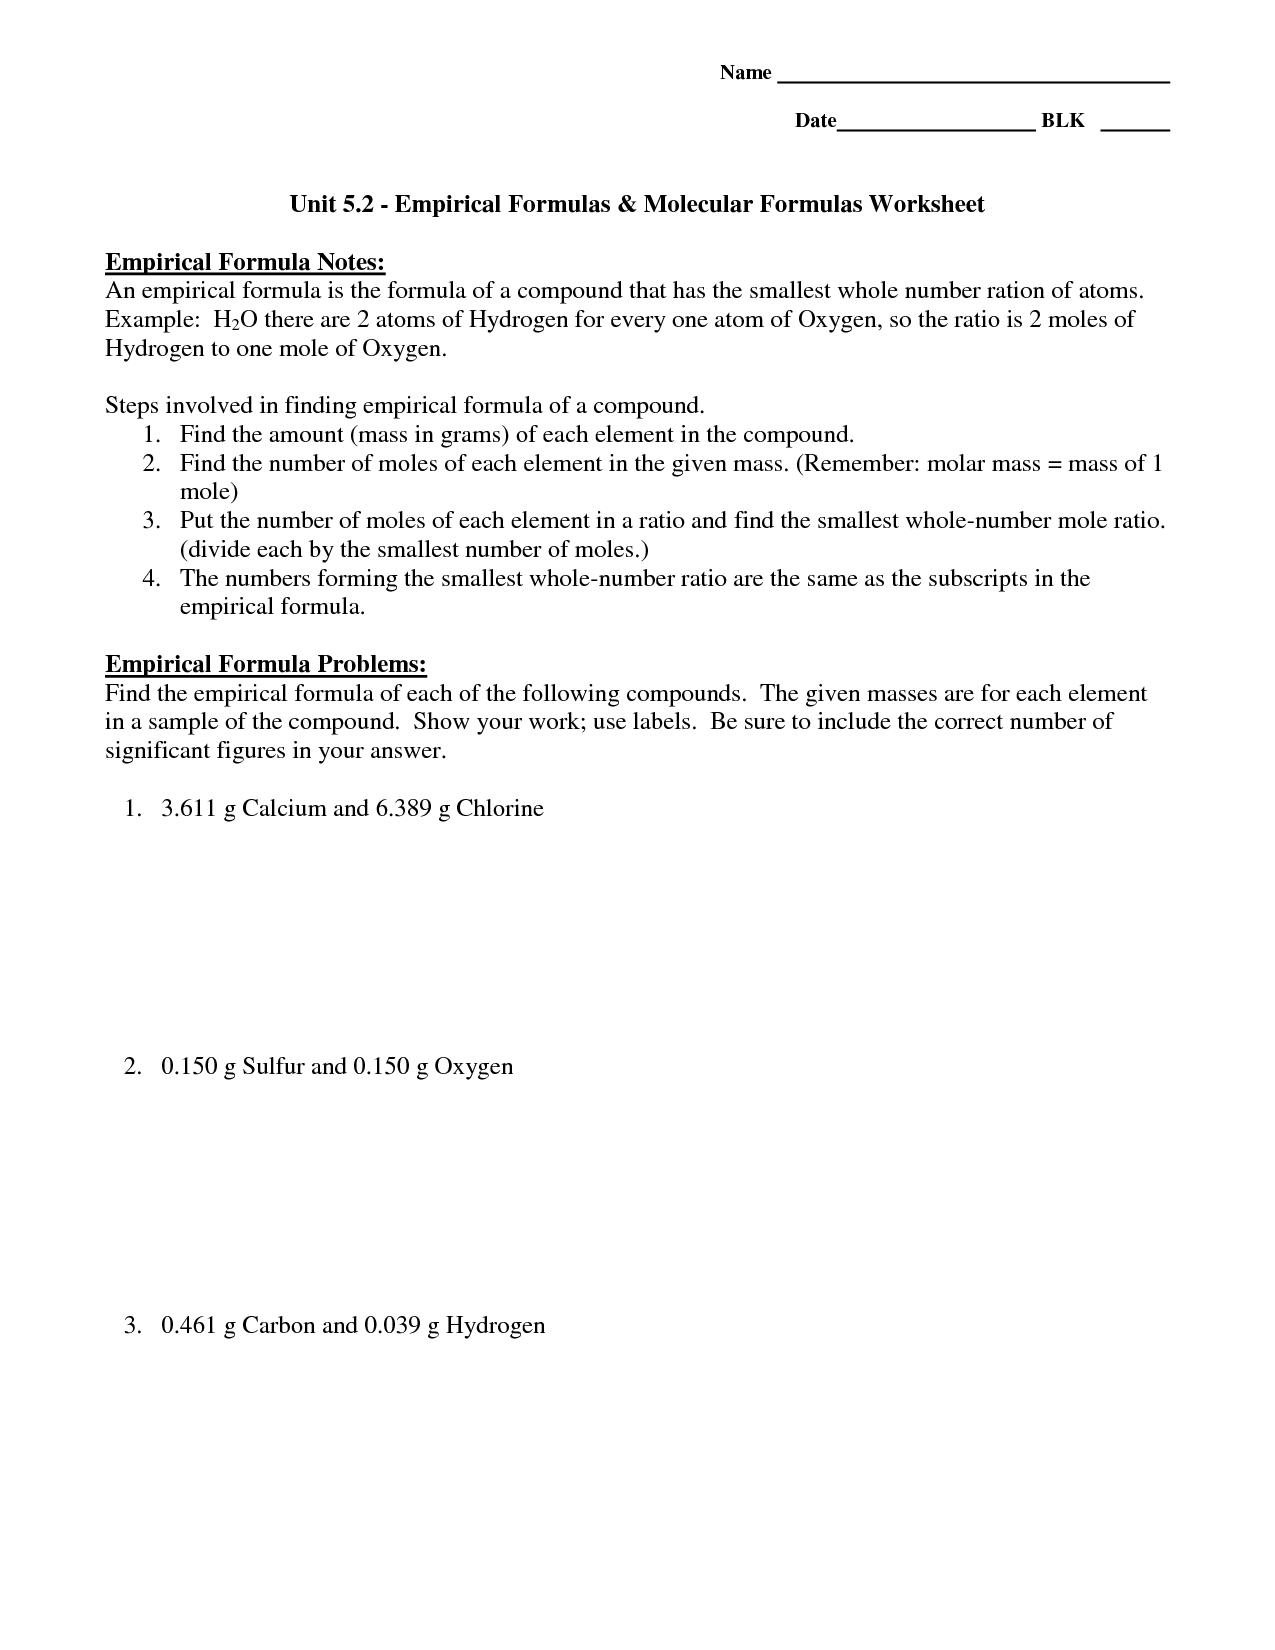 Empirical Formula And Molecular Formula Worksheet Answer Key